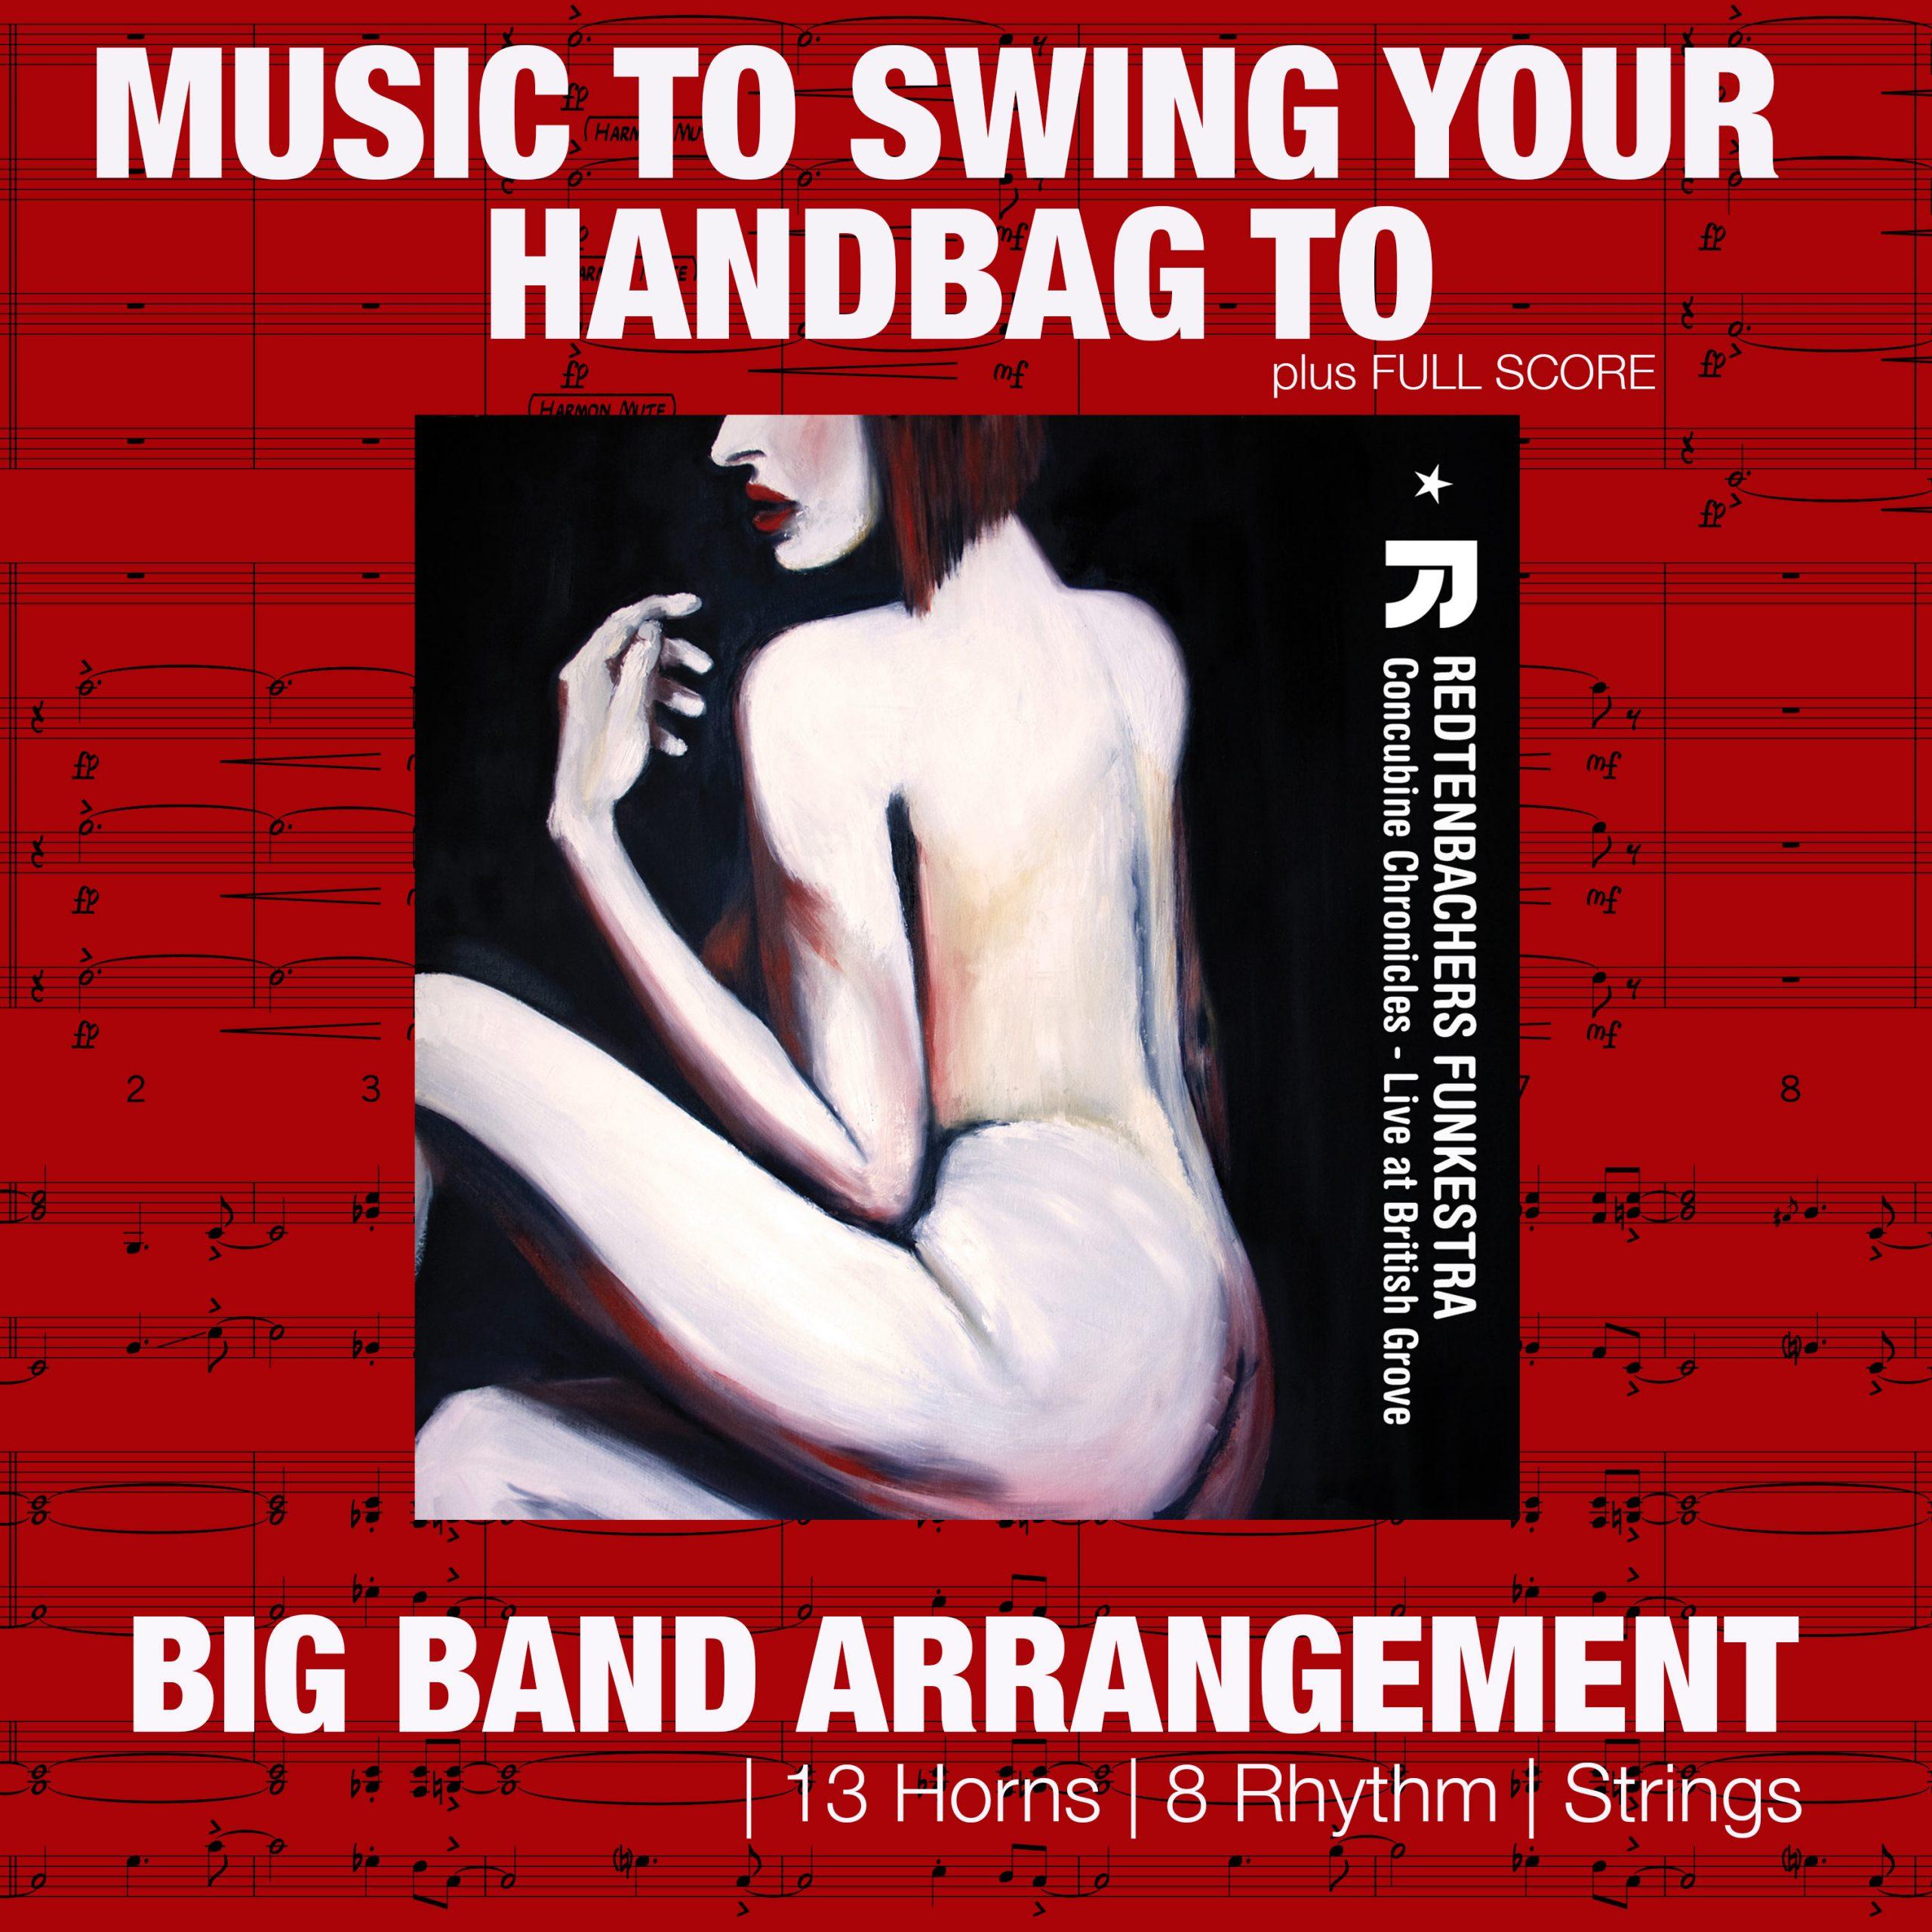 Music To Swing Your Handbag To | Big Band Arrangement